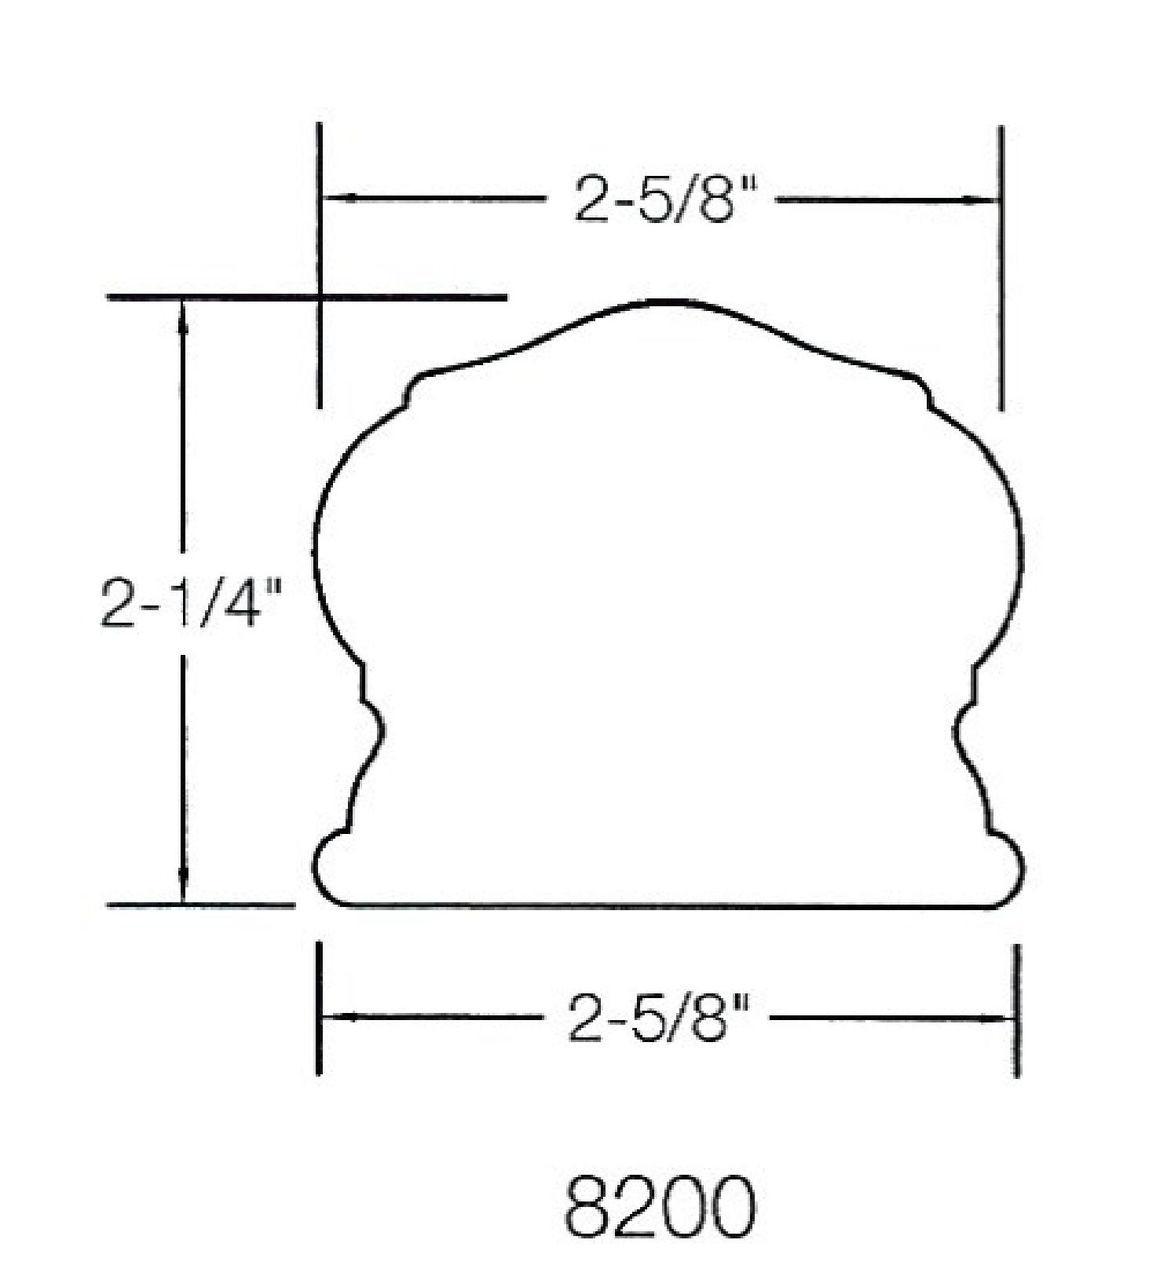 8200 Handrail Dimensional Information